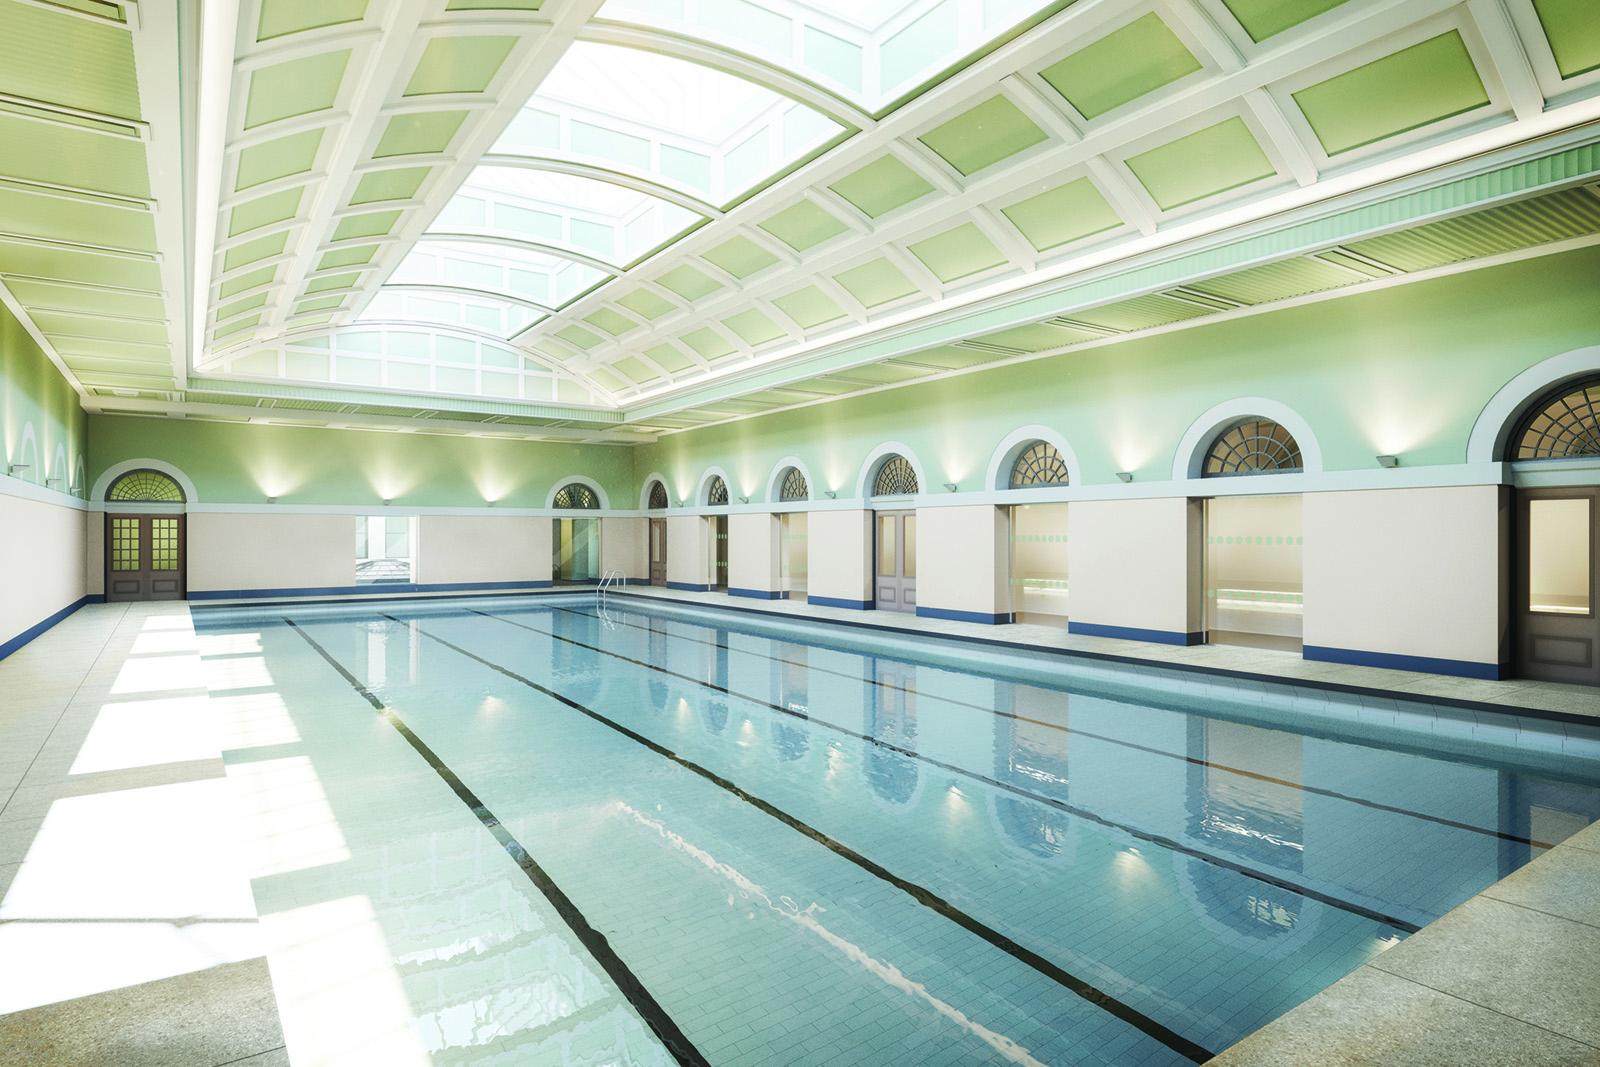 Newcastle city pool for Mounts swimming pool northampton